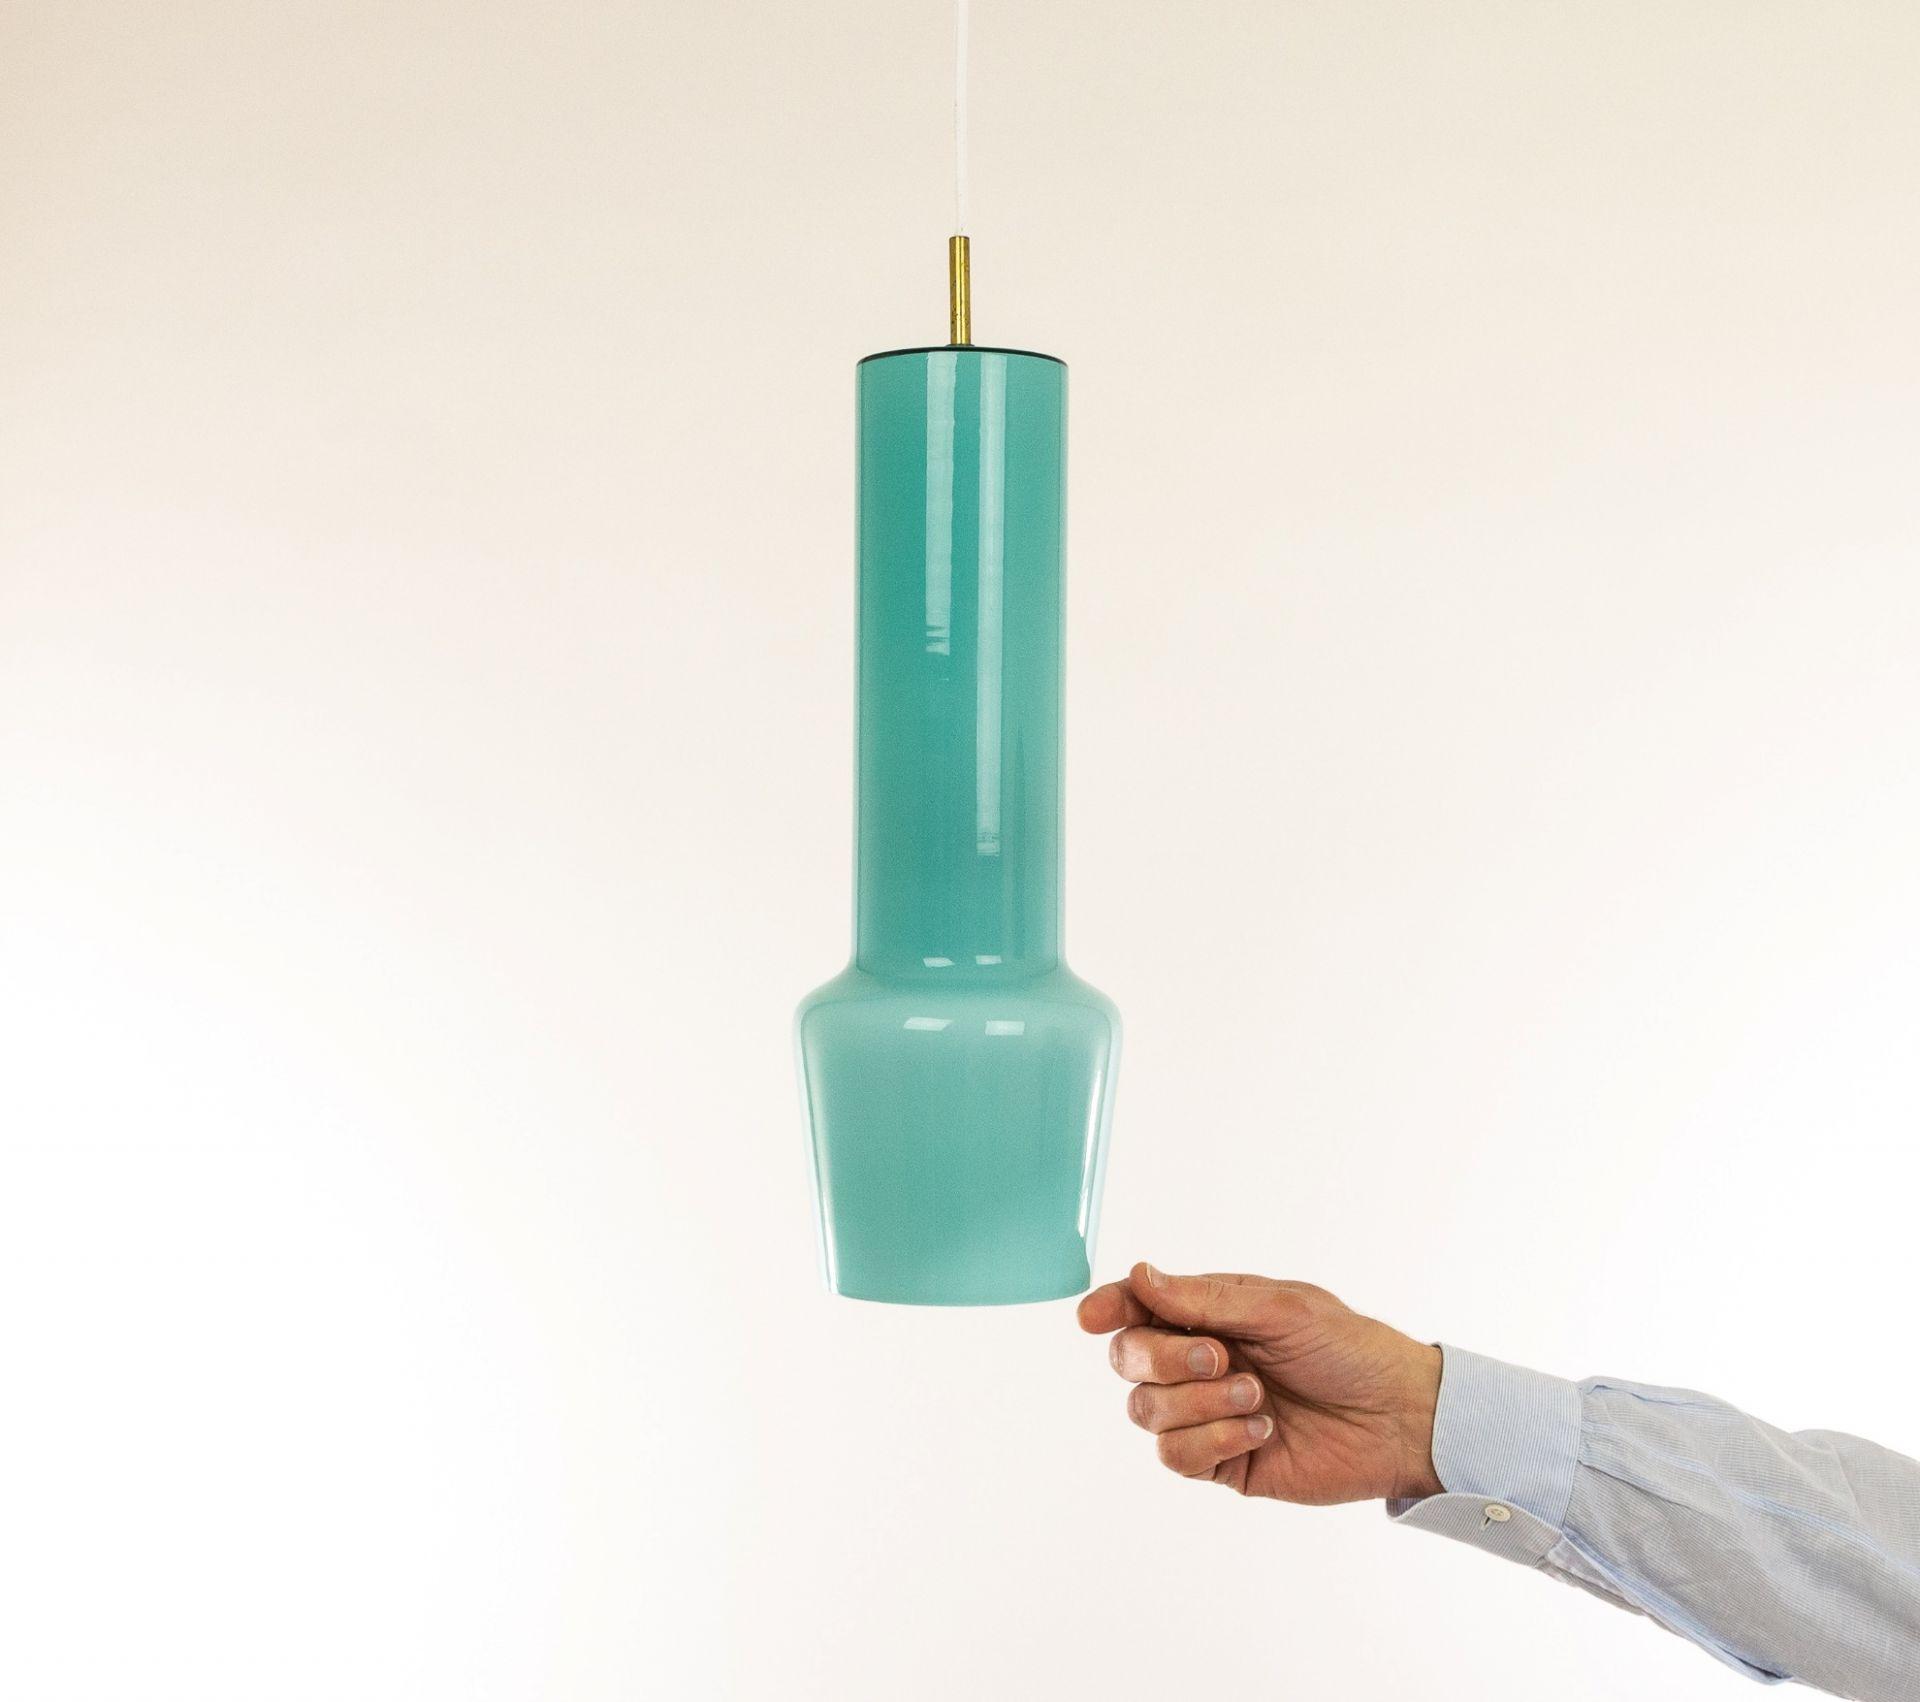 Turquoise glass pendant by Massimo Vignelli for Venini, 1950s